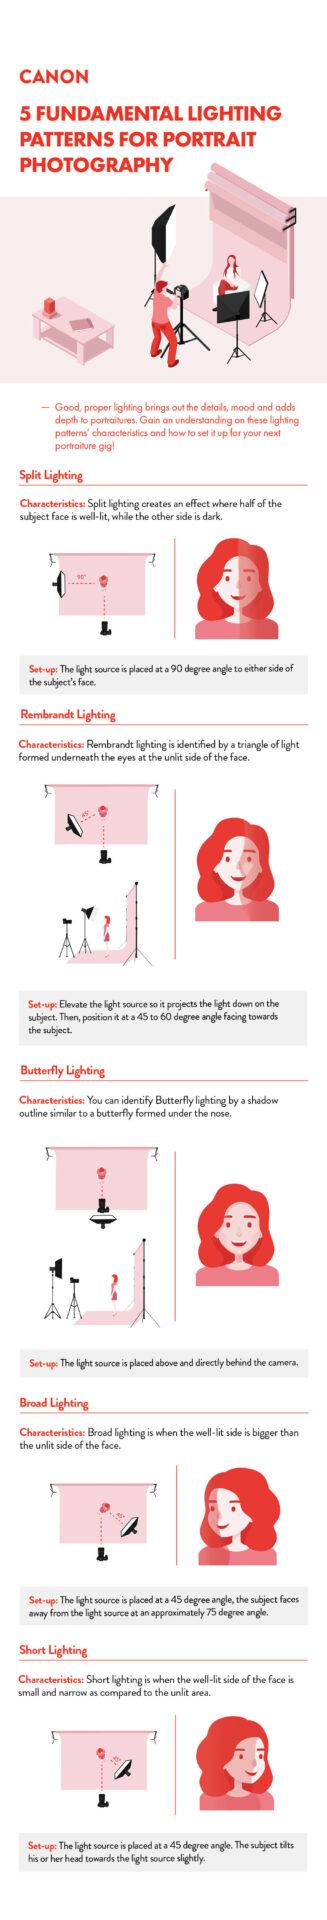 Infographic Lighting Settings for Home Photoshoot Studio